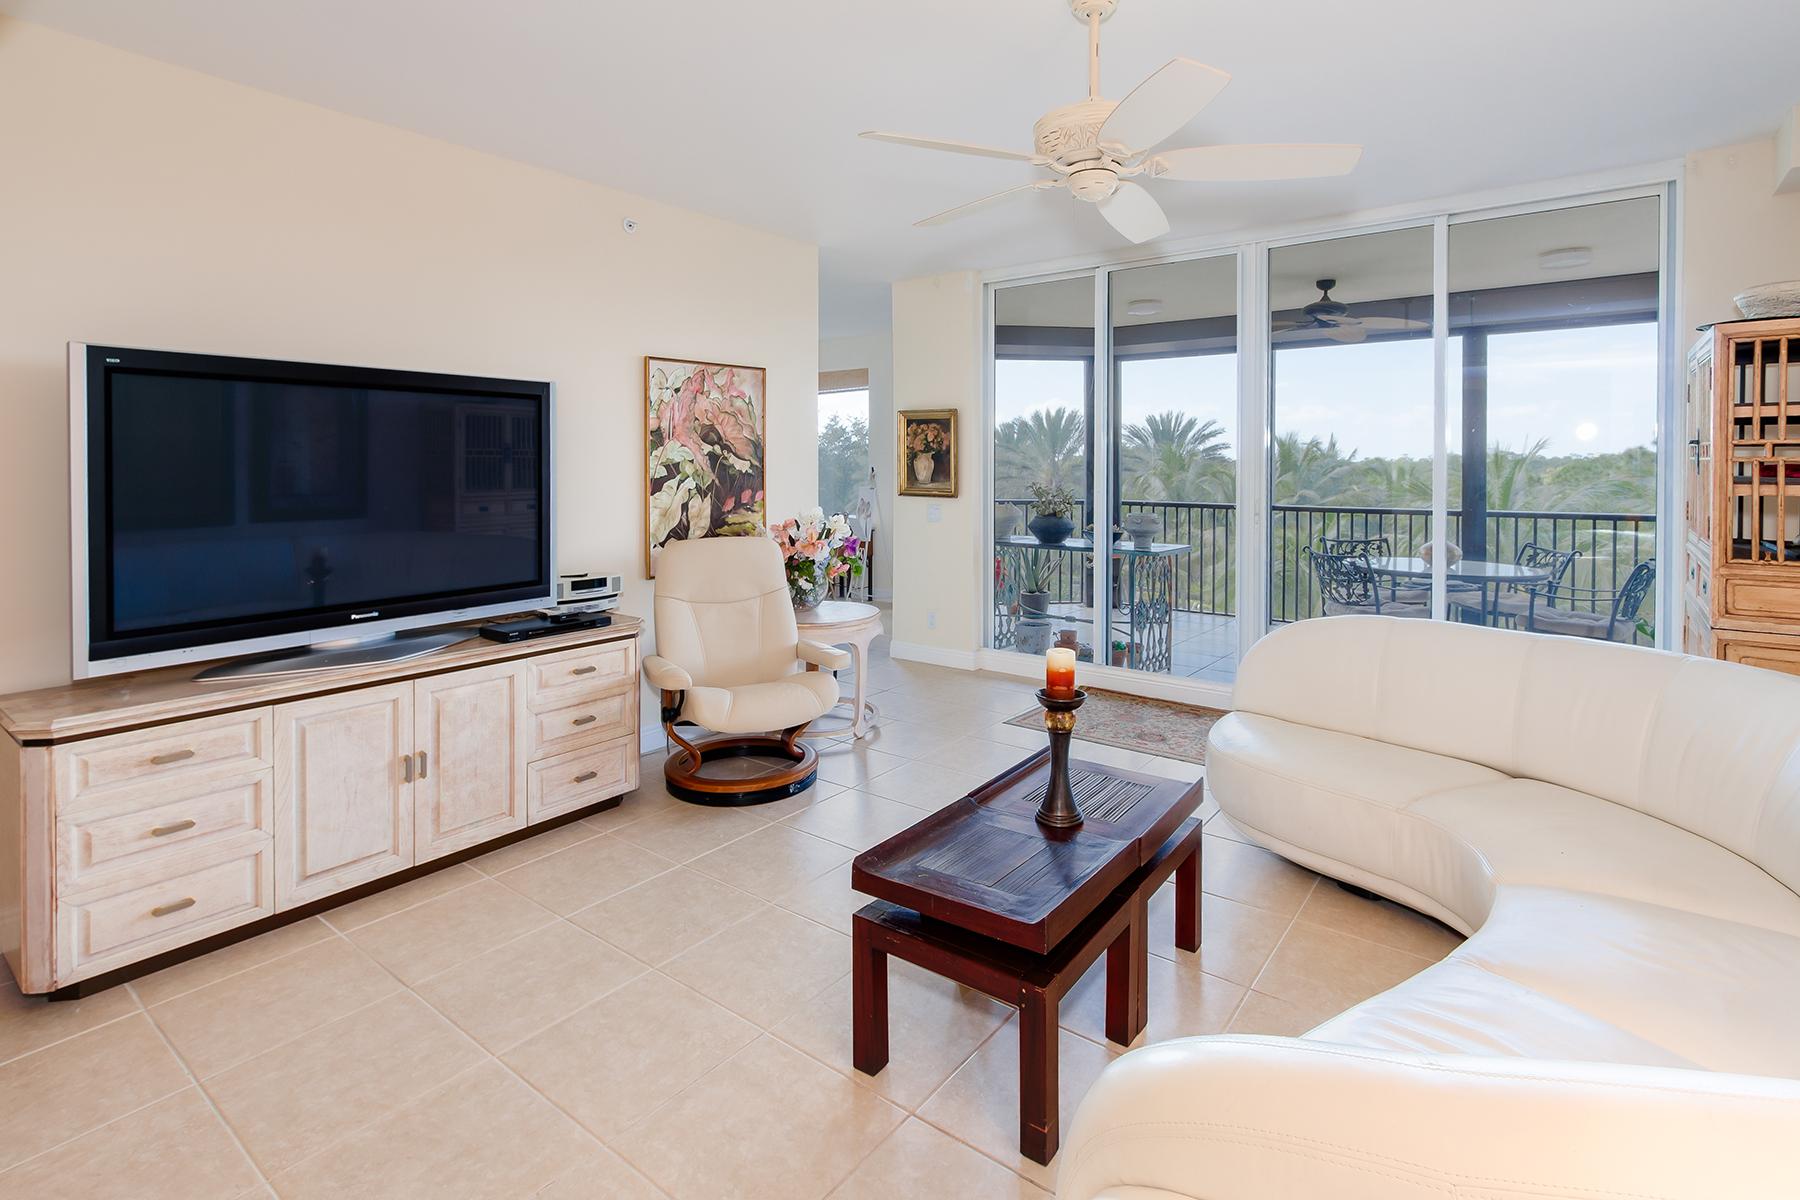 Condomínio para Venda às THE COLONY AT PELICAN LANDING - SORRENTO 23650 Via Veneto Blvd 302 Bonita Springs, Florida, 34134 Estados Unidos